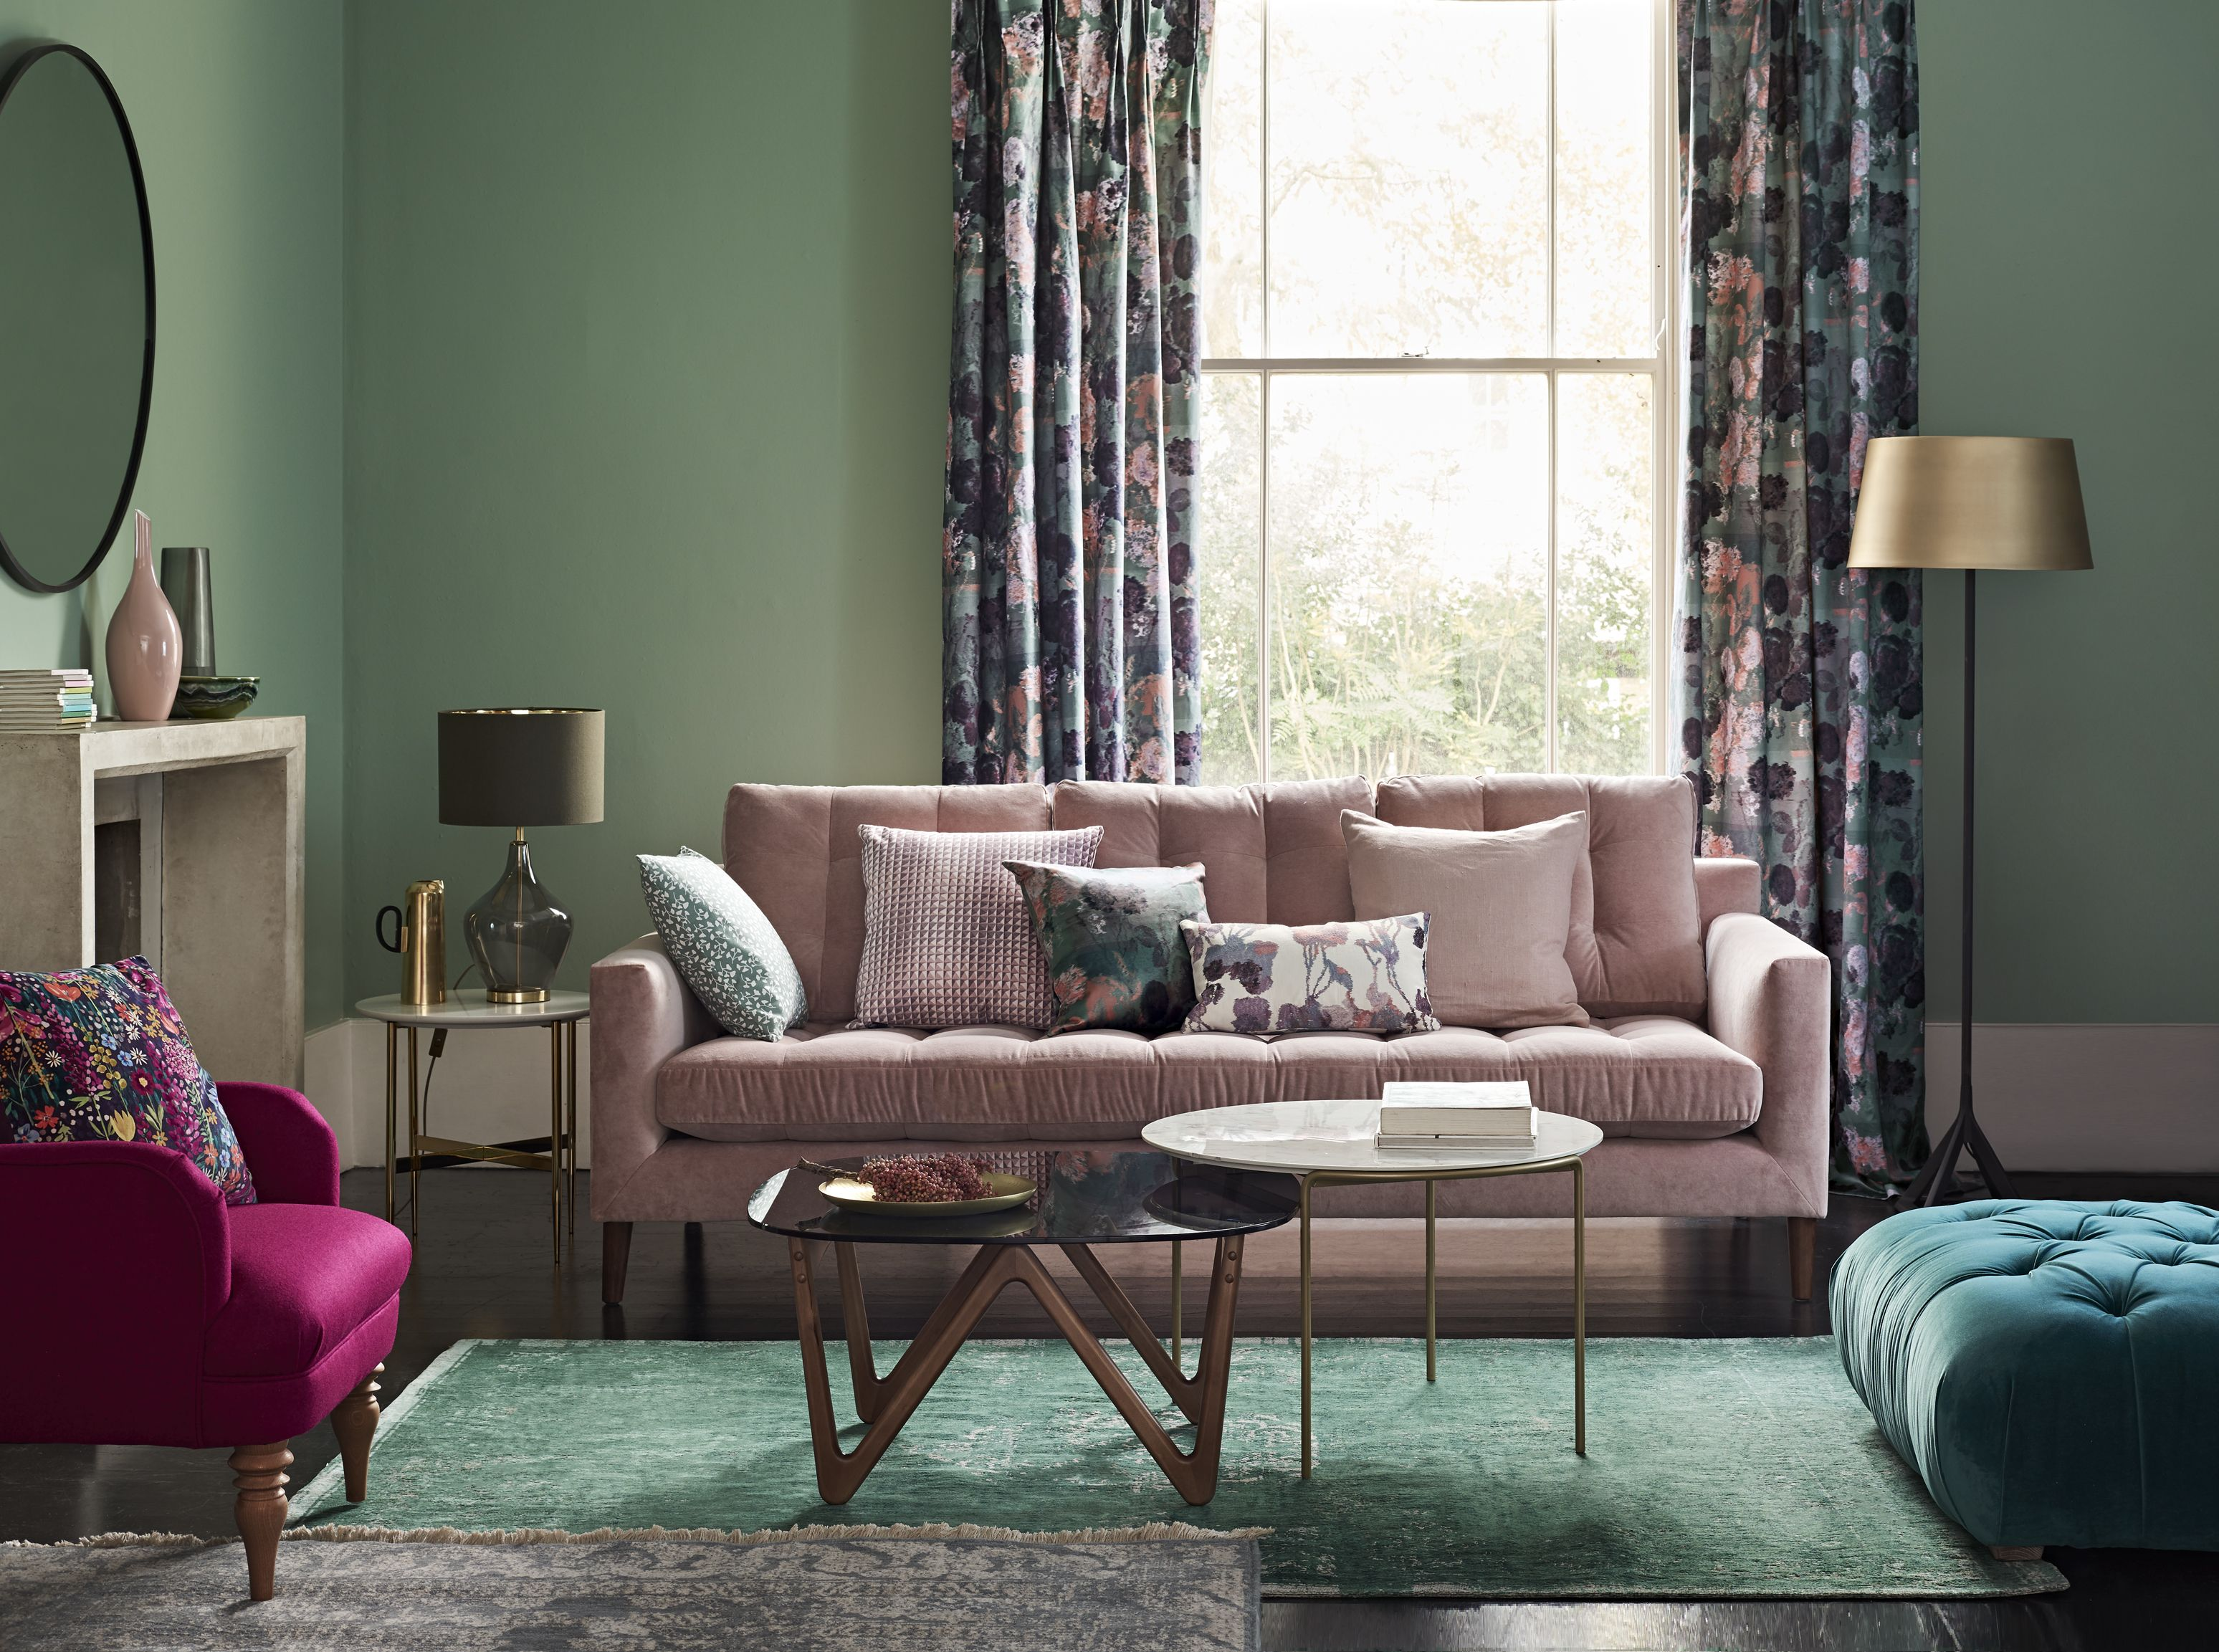 Sterling Armchair Fushia, Draper Grand Sofa, Curtains Capella Print Fabric,  All From John